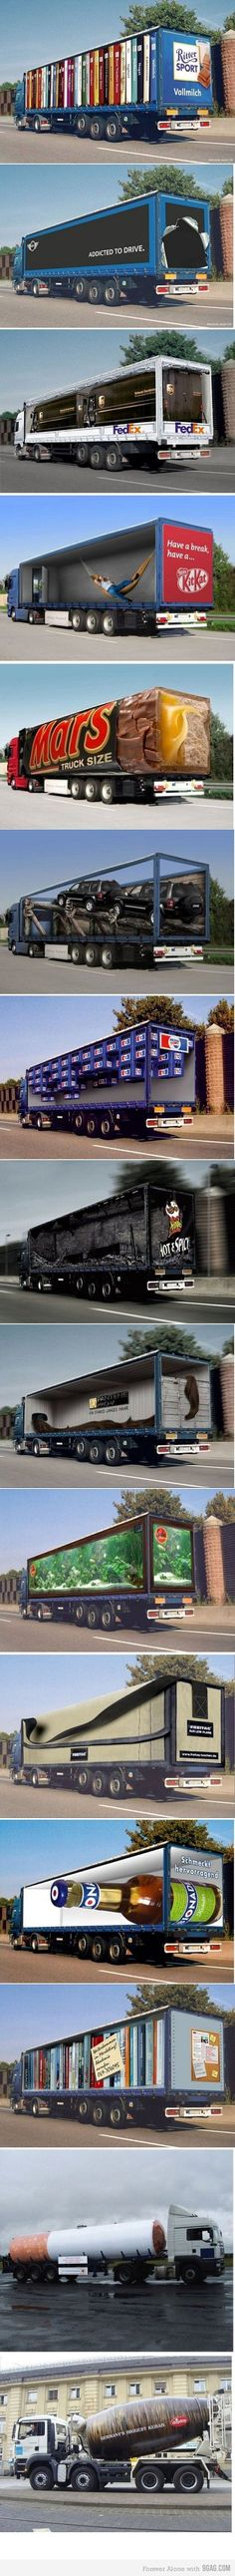 Esempi di ambient marketing sui camion. Geniali!